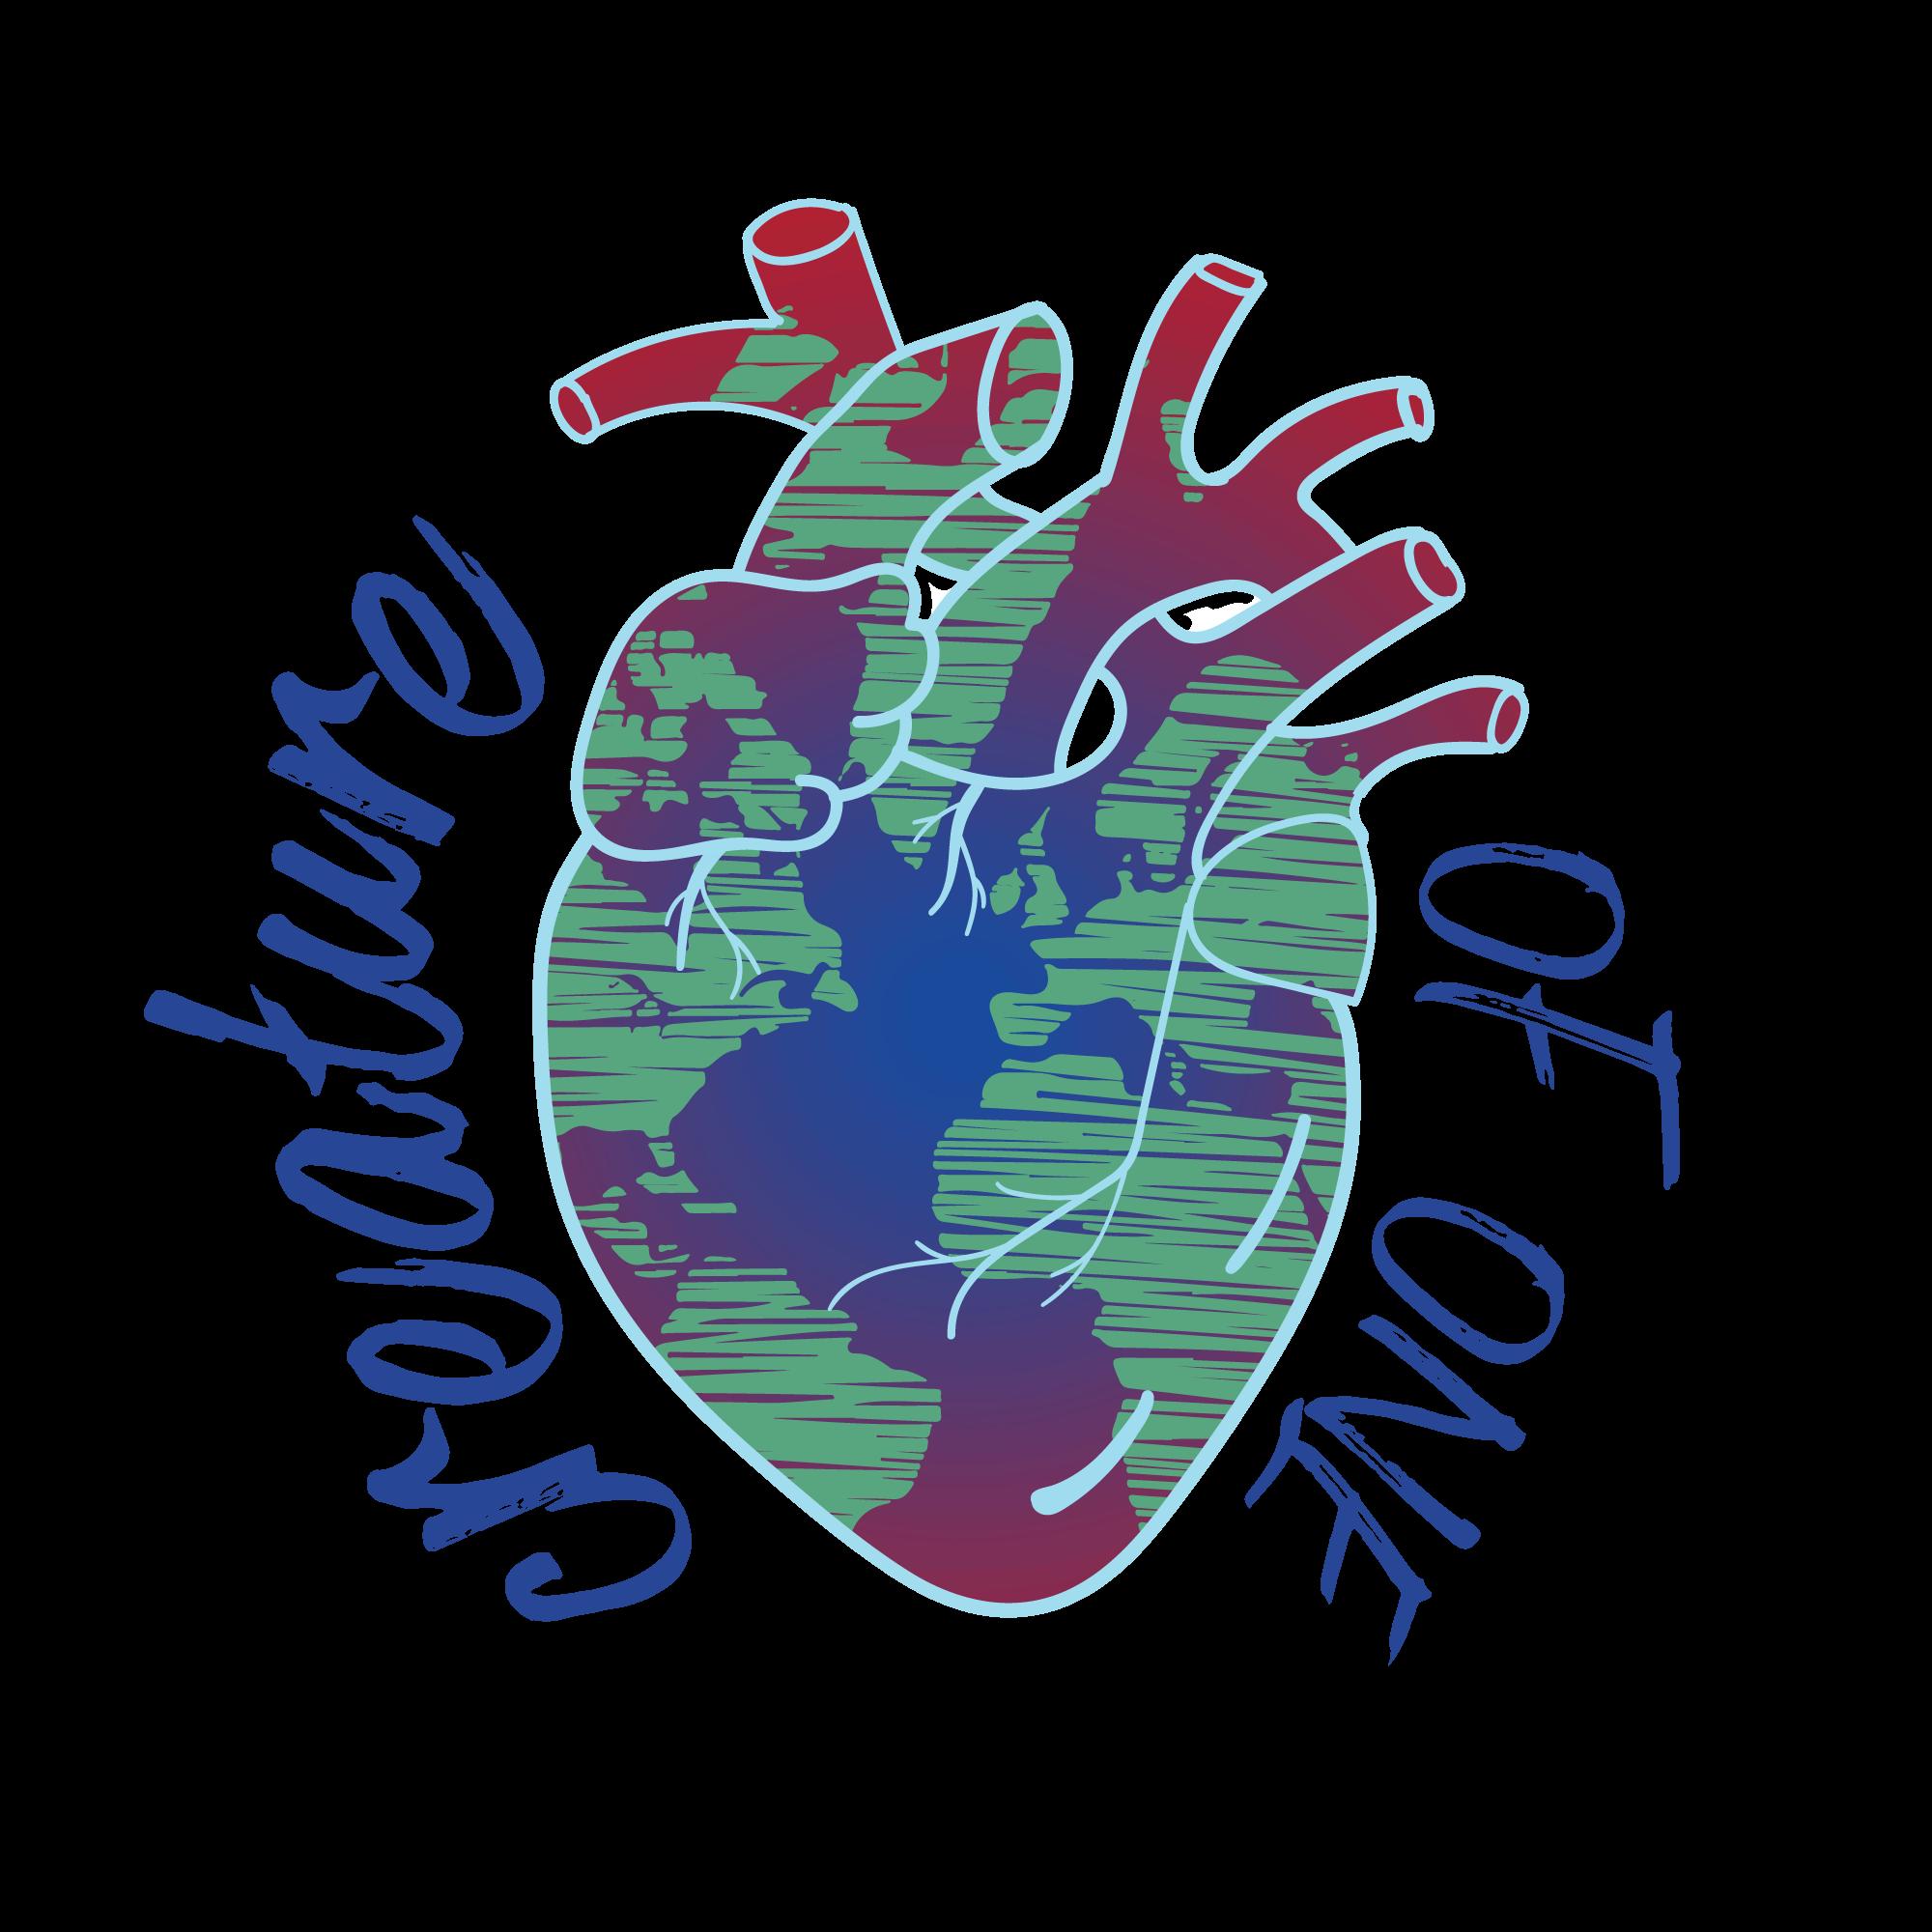 CreatureofOne_Logo1_Color_2000x2000.png